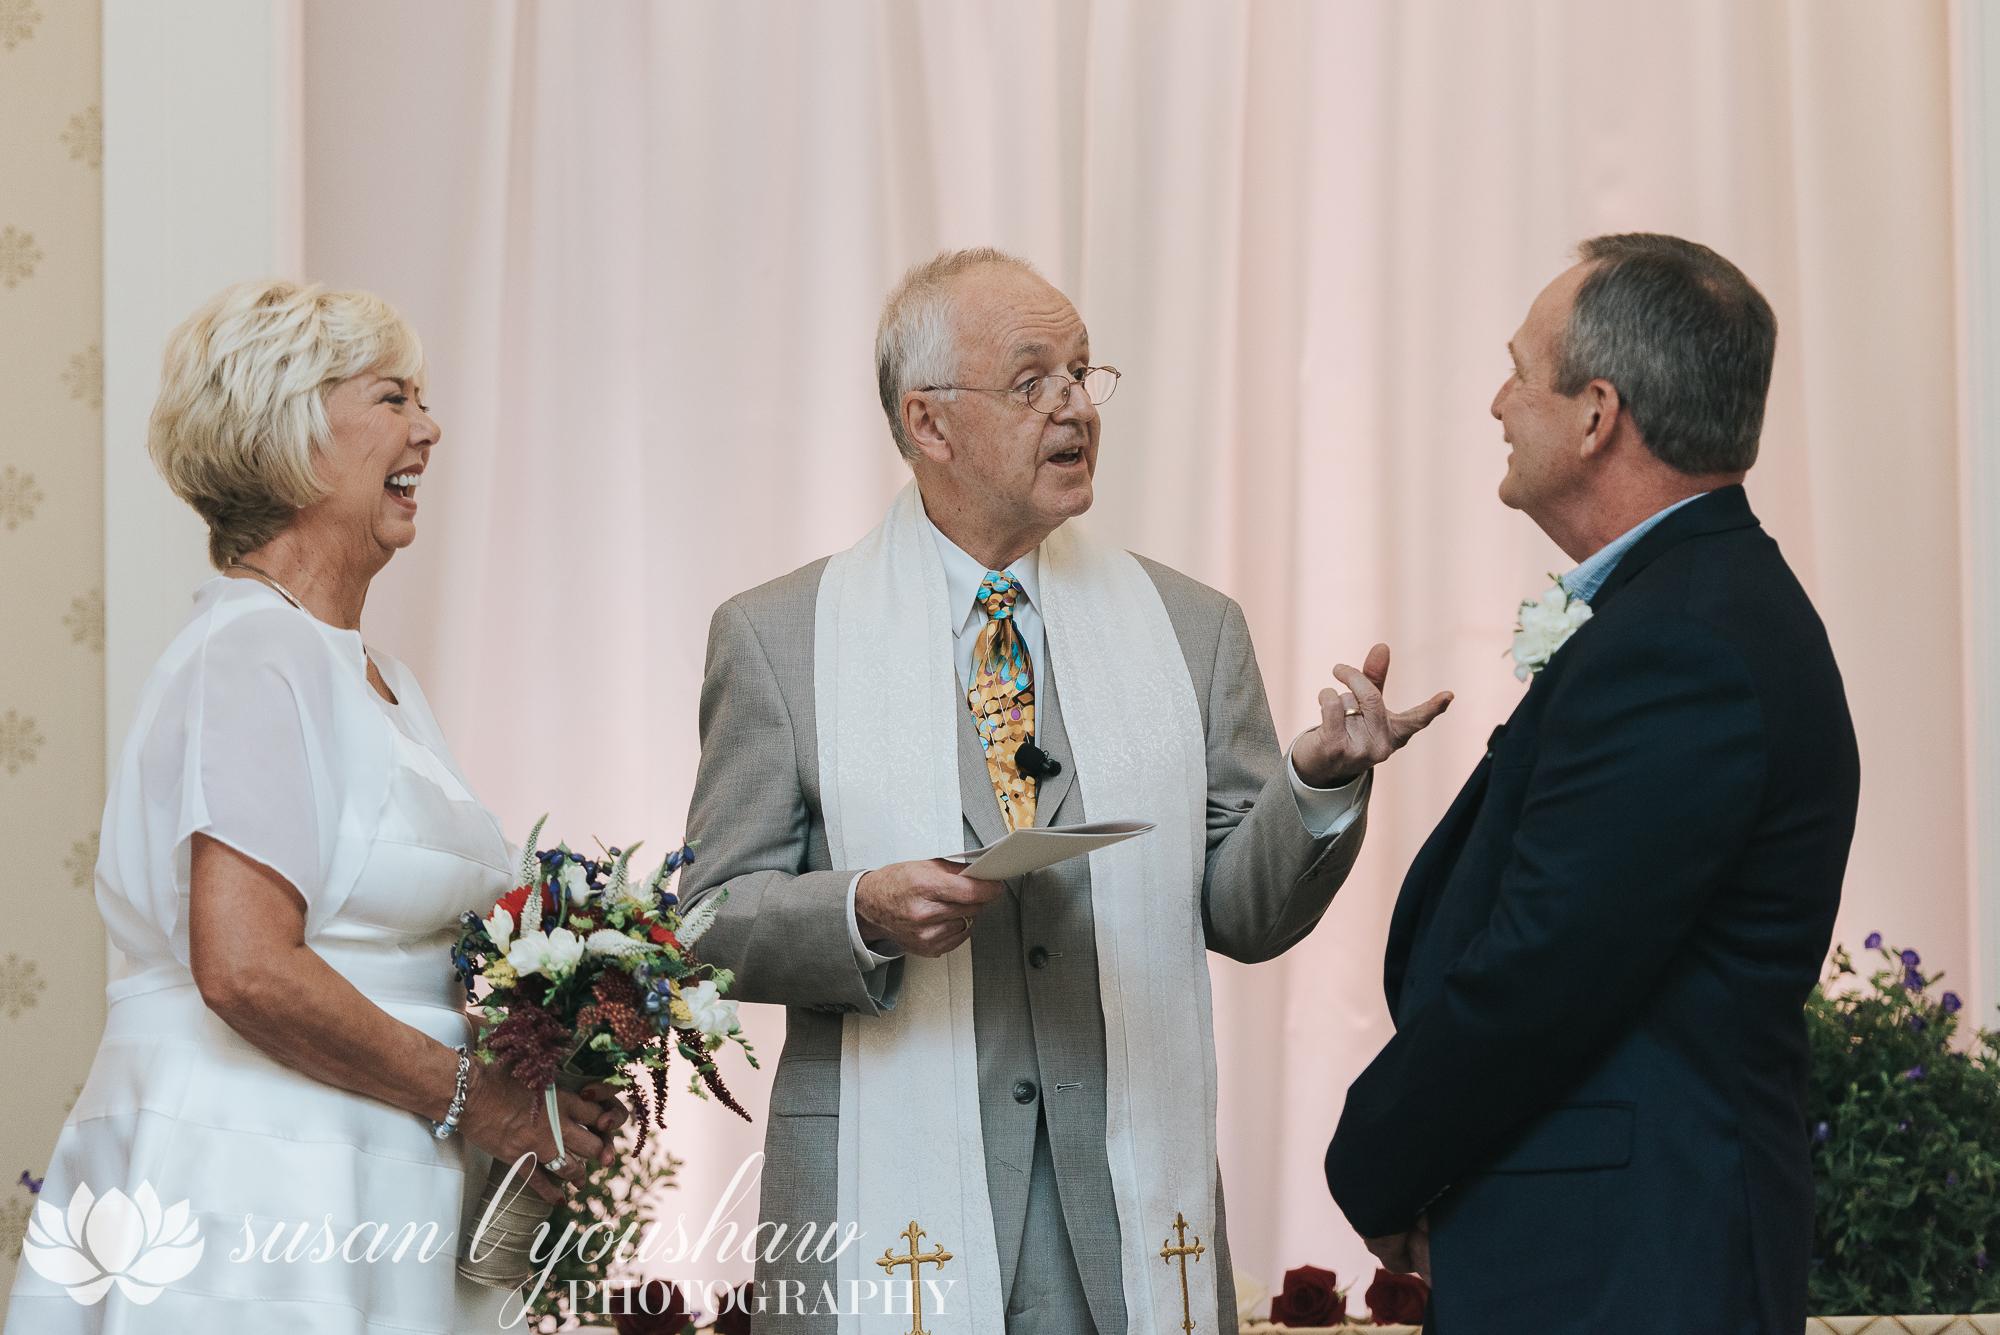 BLOG Carolyn Adams and Jim McCune 07-04-2018 SLY Photography-72.jpg